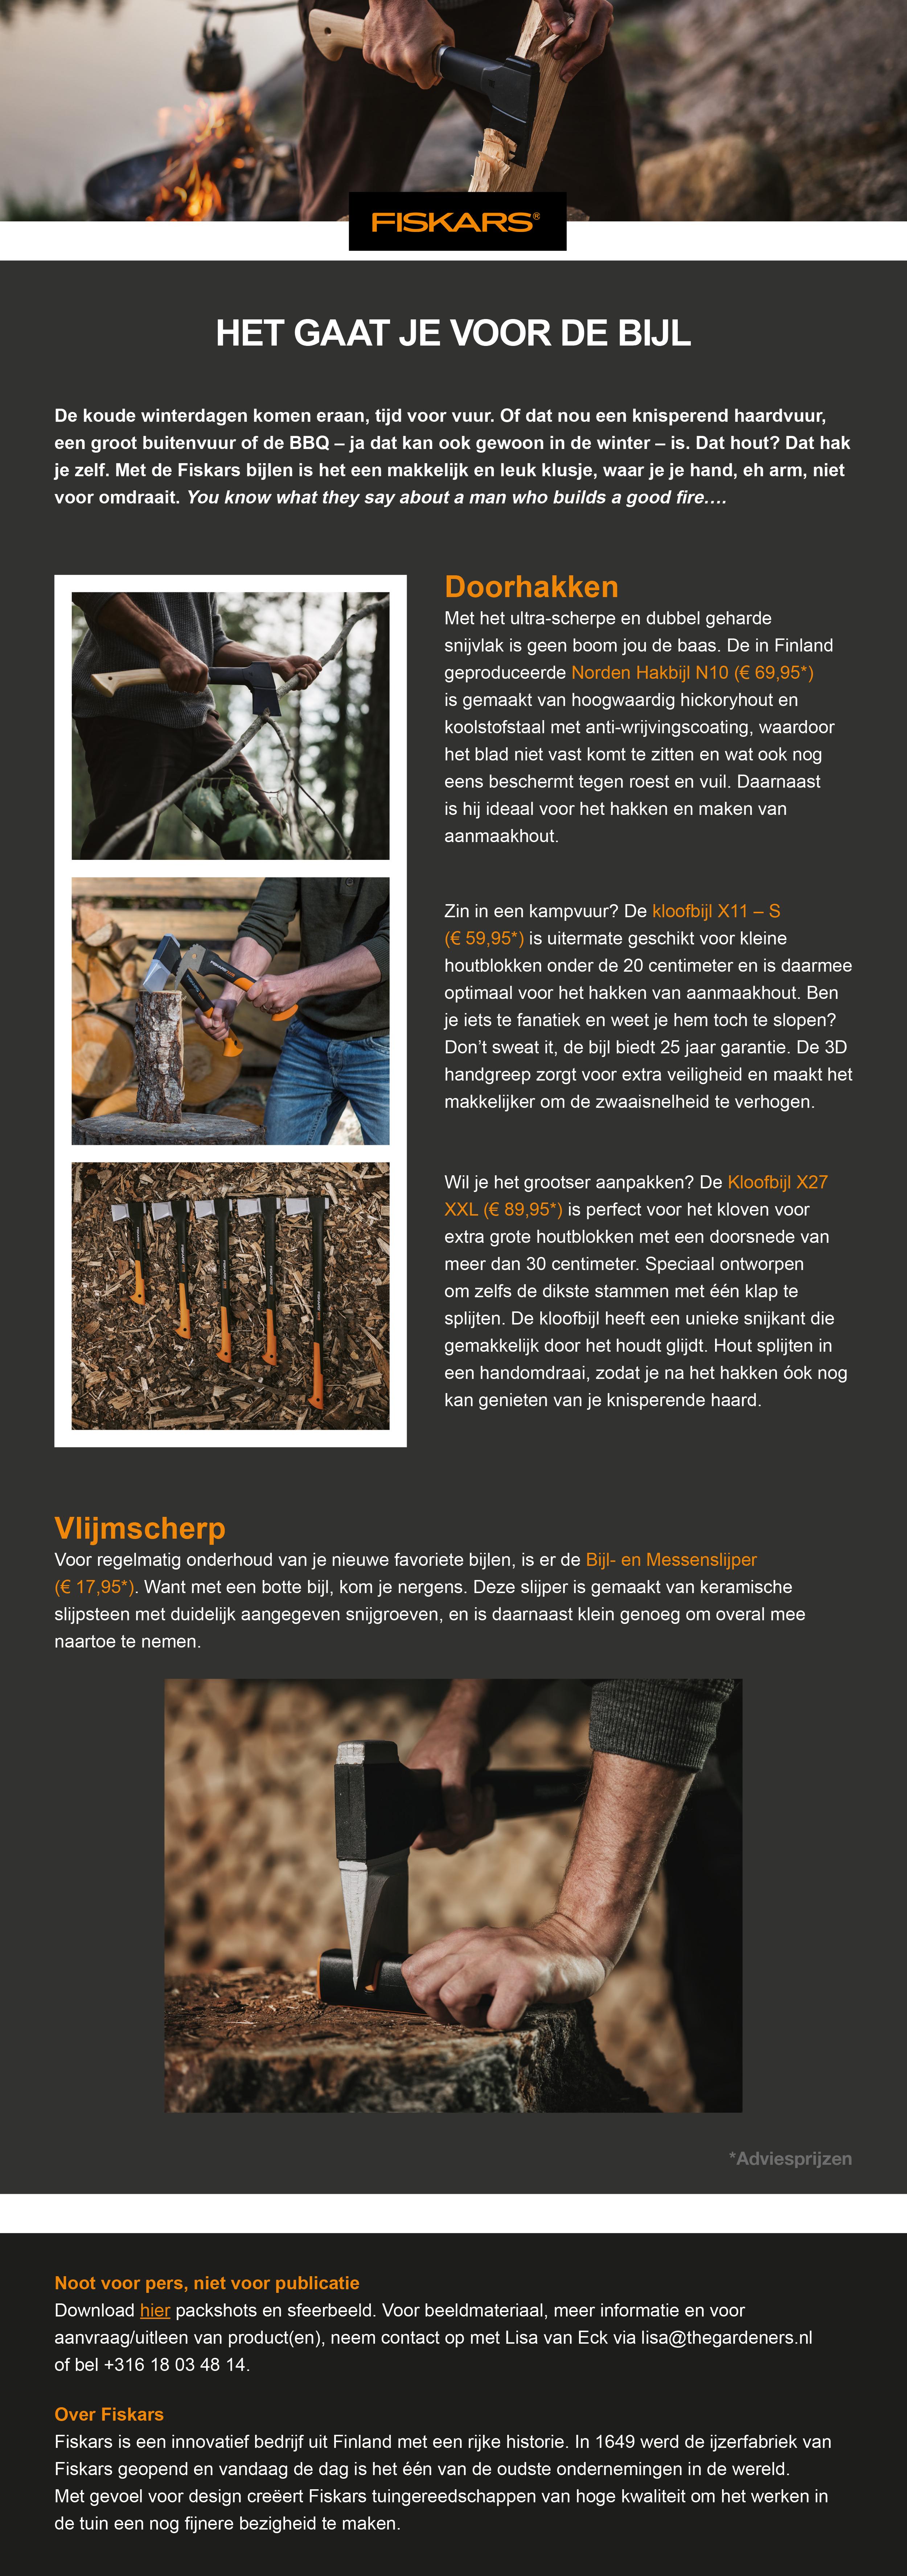 Persbericht - Fiskars